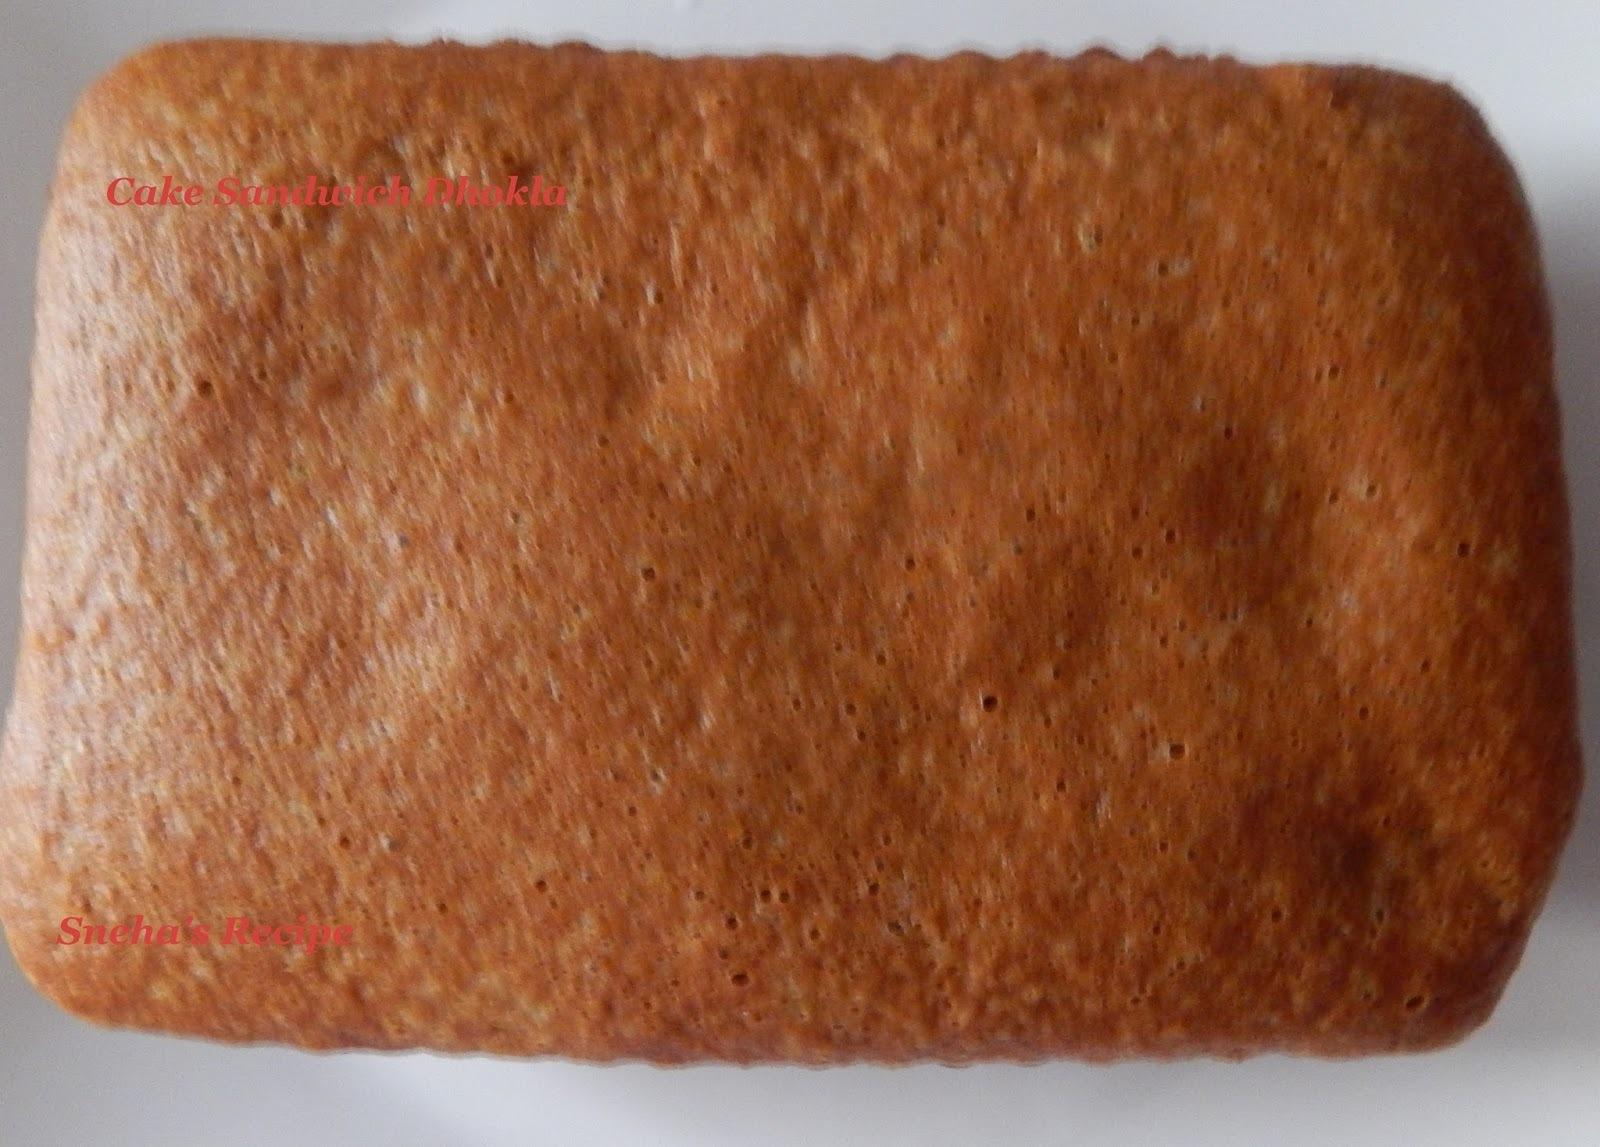 Cake Sandwich Dhokla